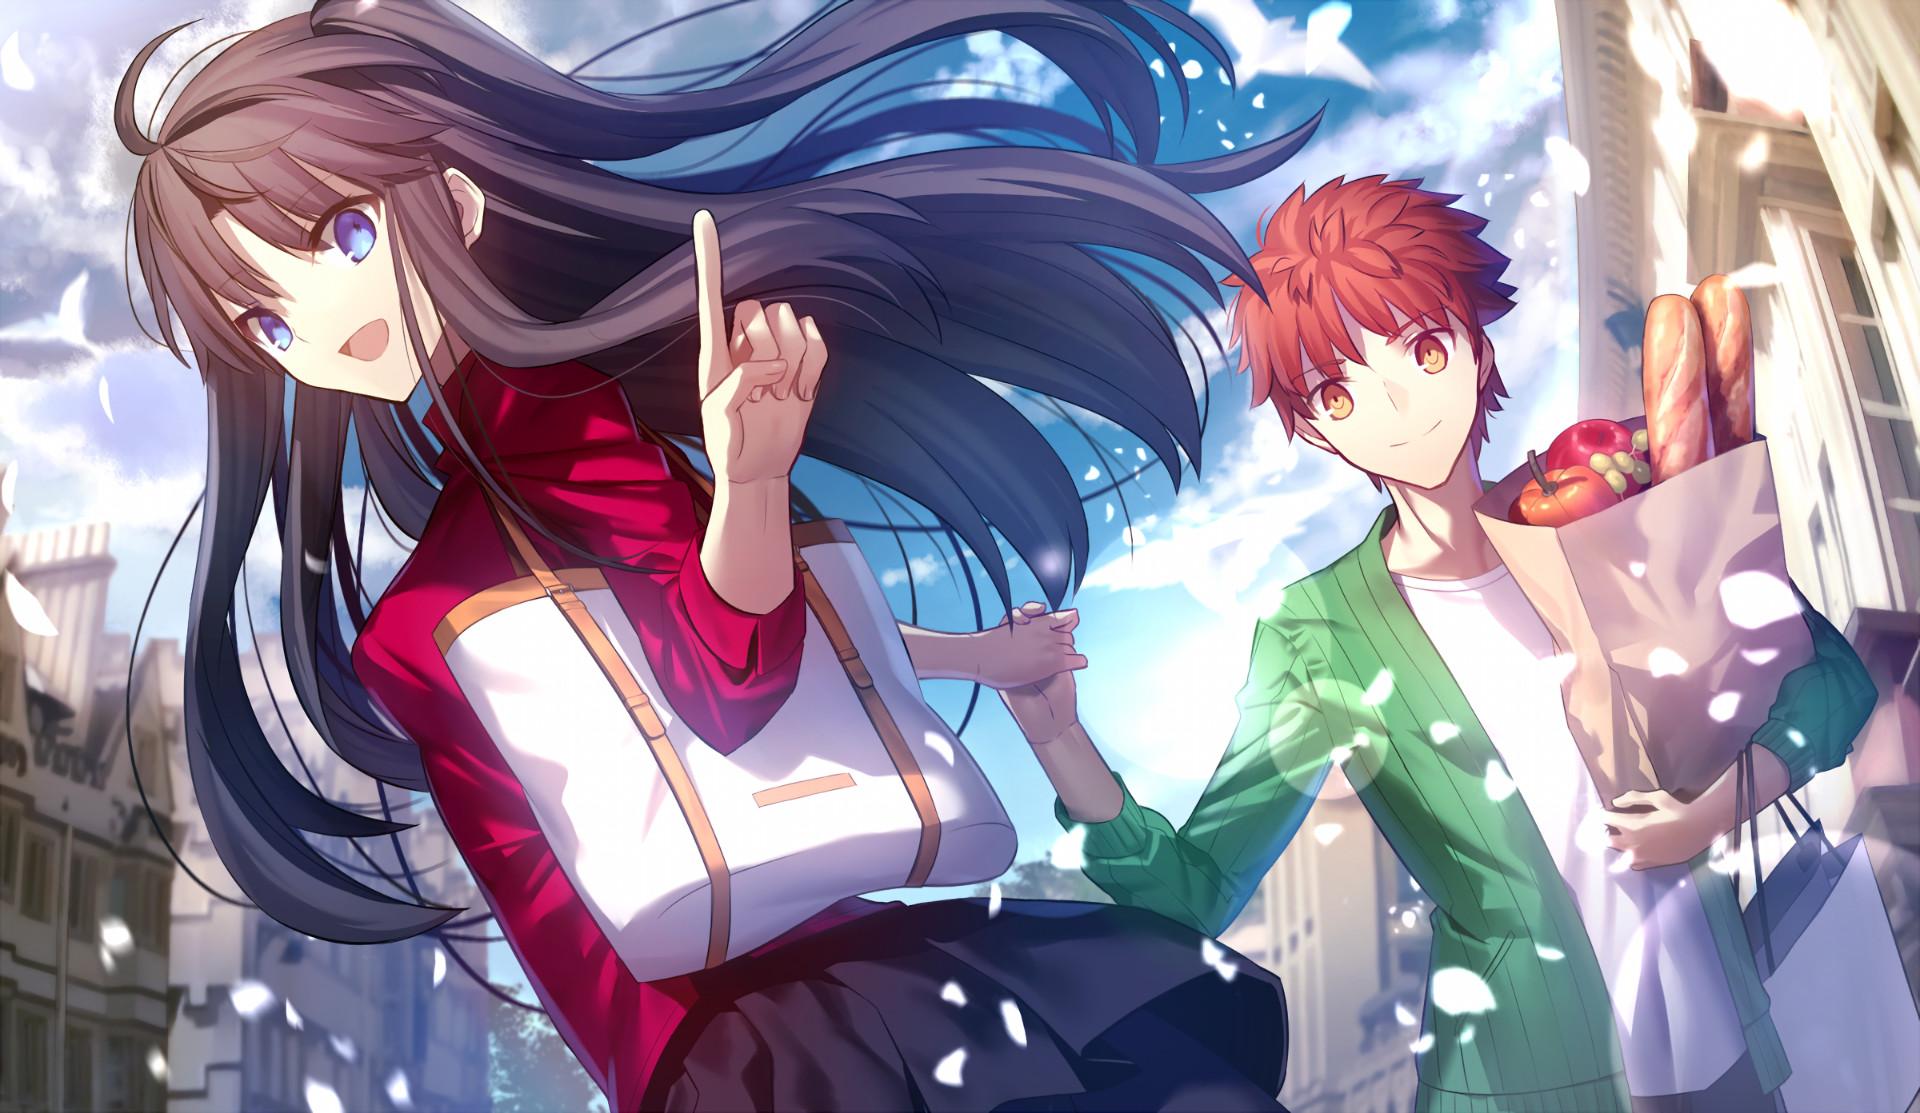 Anime – Fate/Stay Night: Unlimited Blade Works Shirou Emiya Rin Tohsaka  Wallpaper